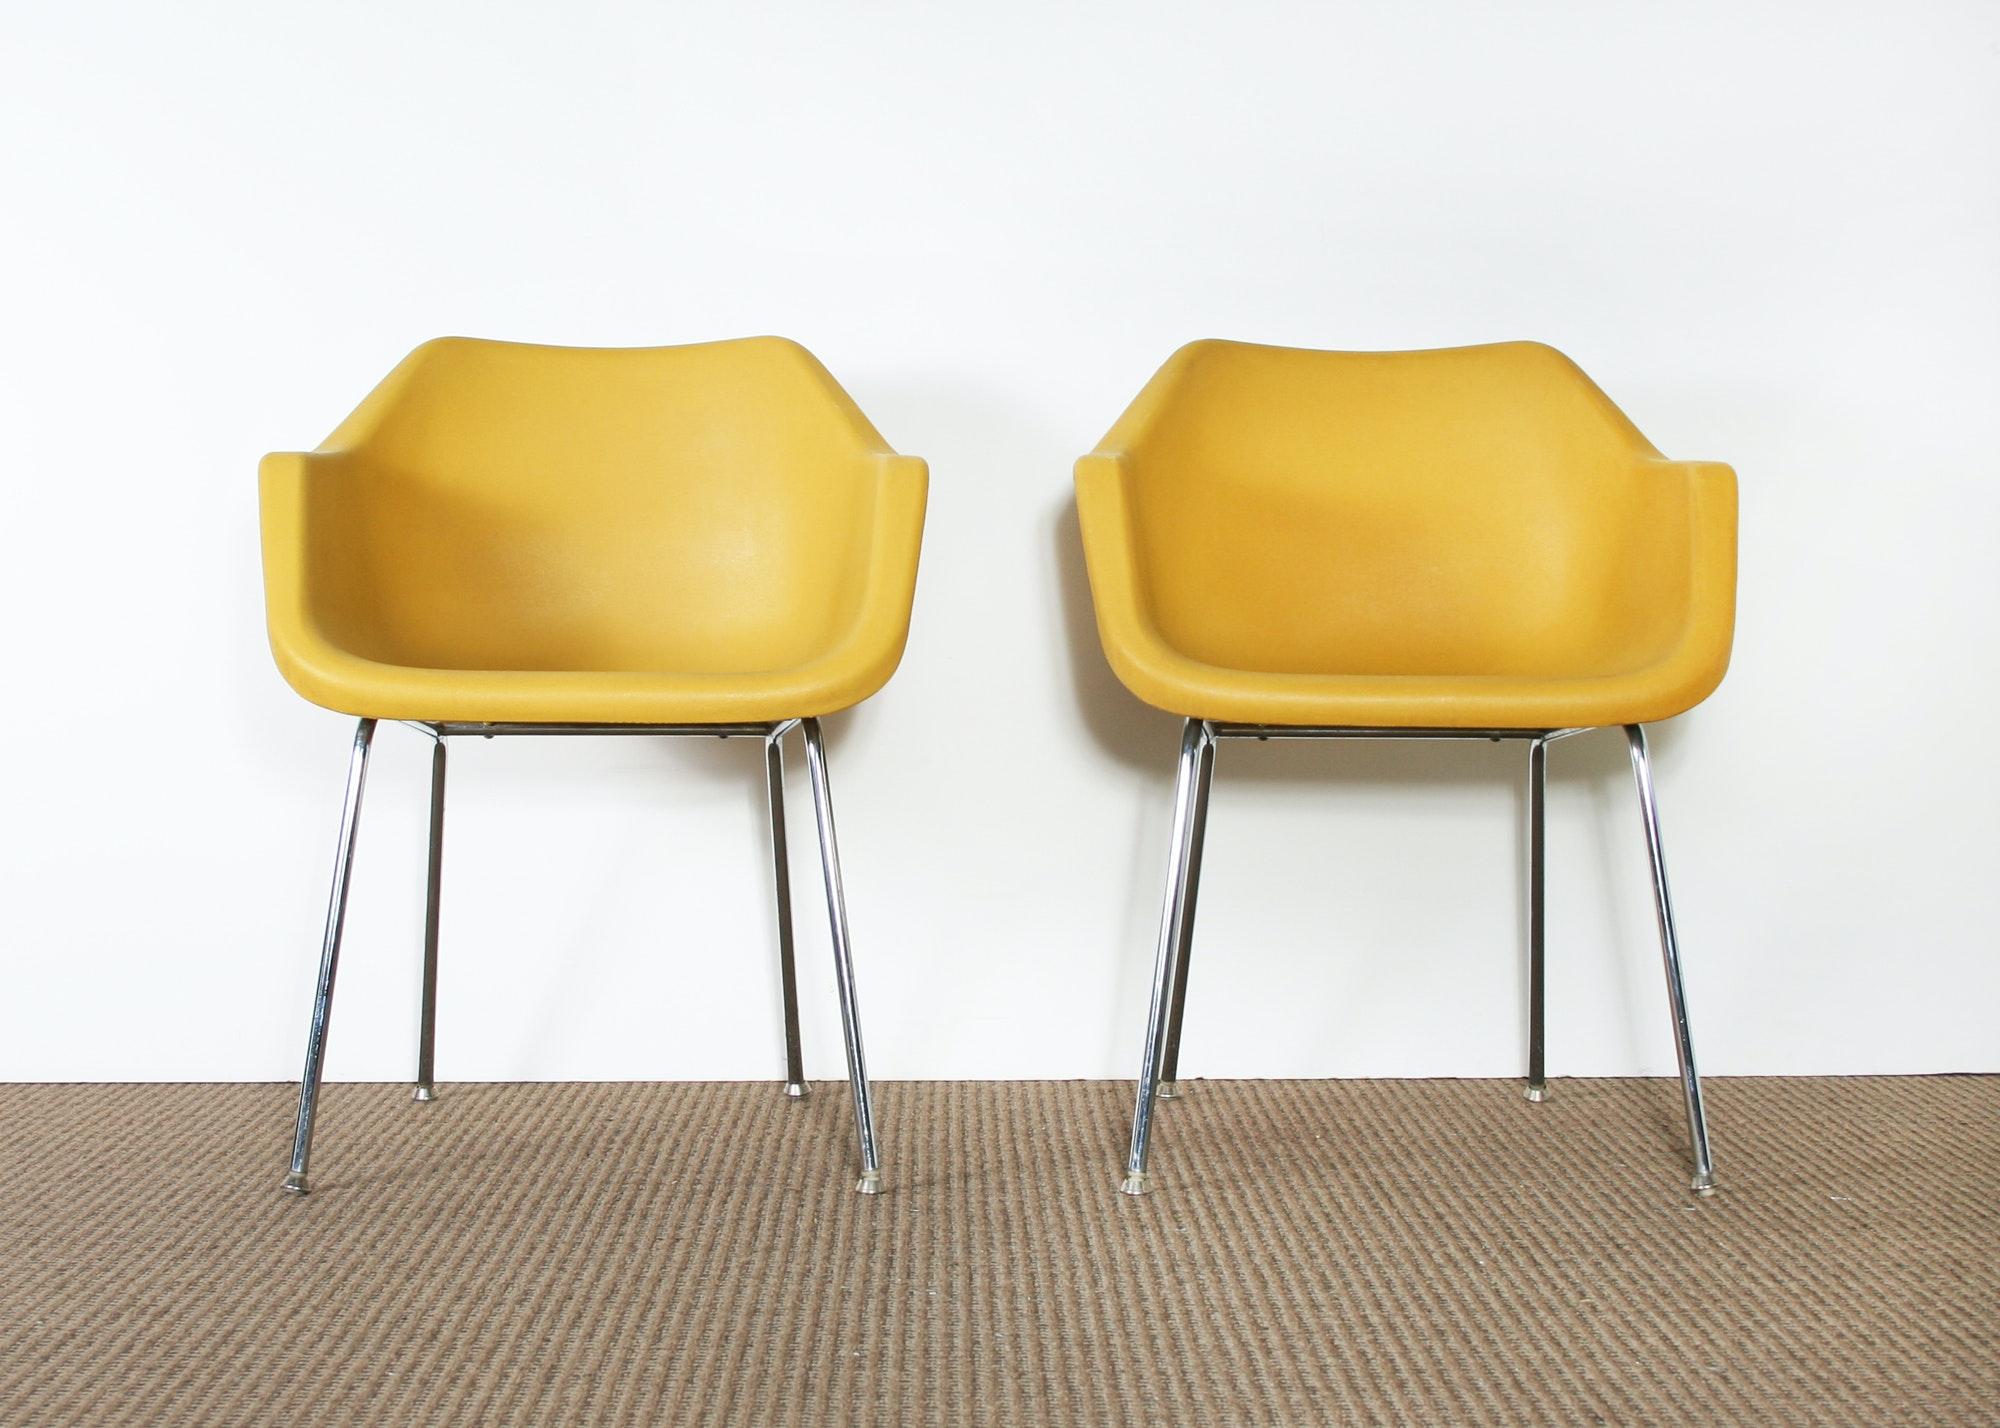 Marvelous Set Of Two Mid Century Modern Yellow John Stuart Chairs ...